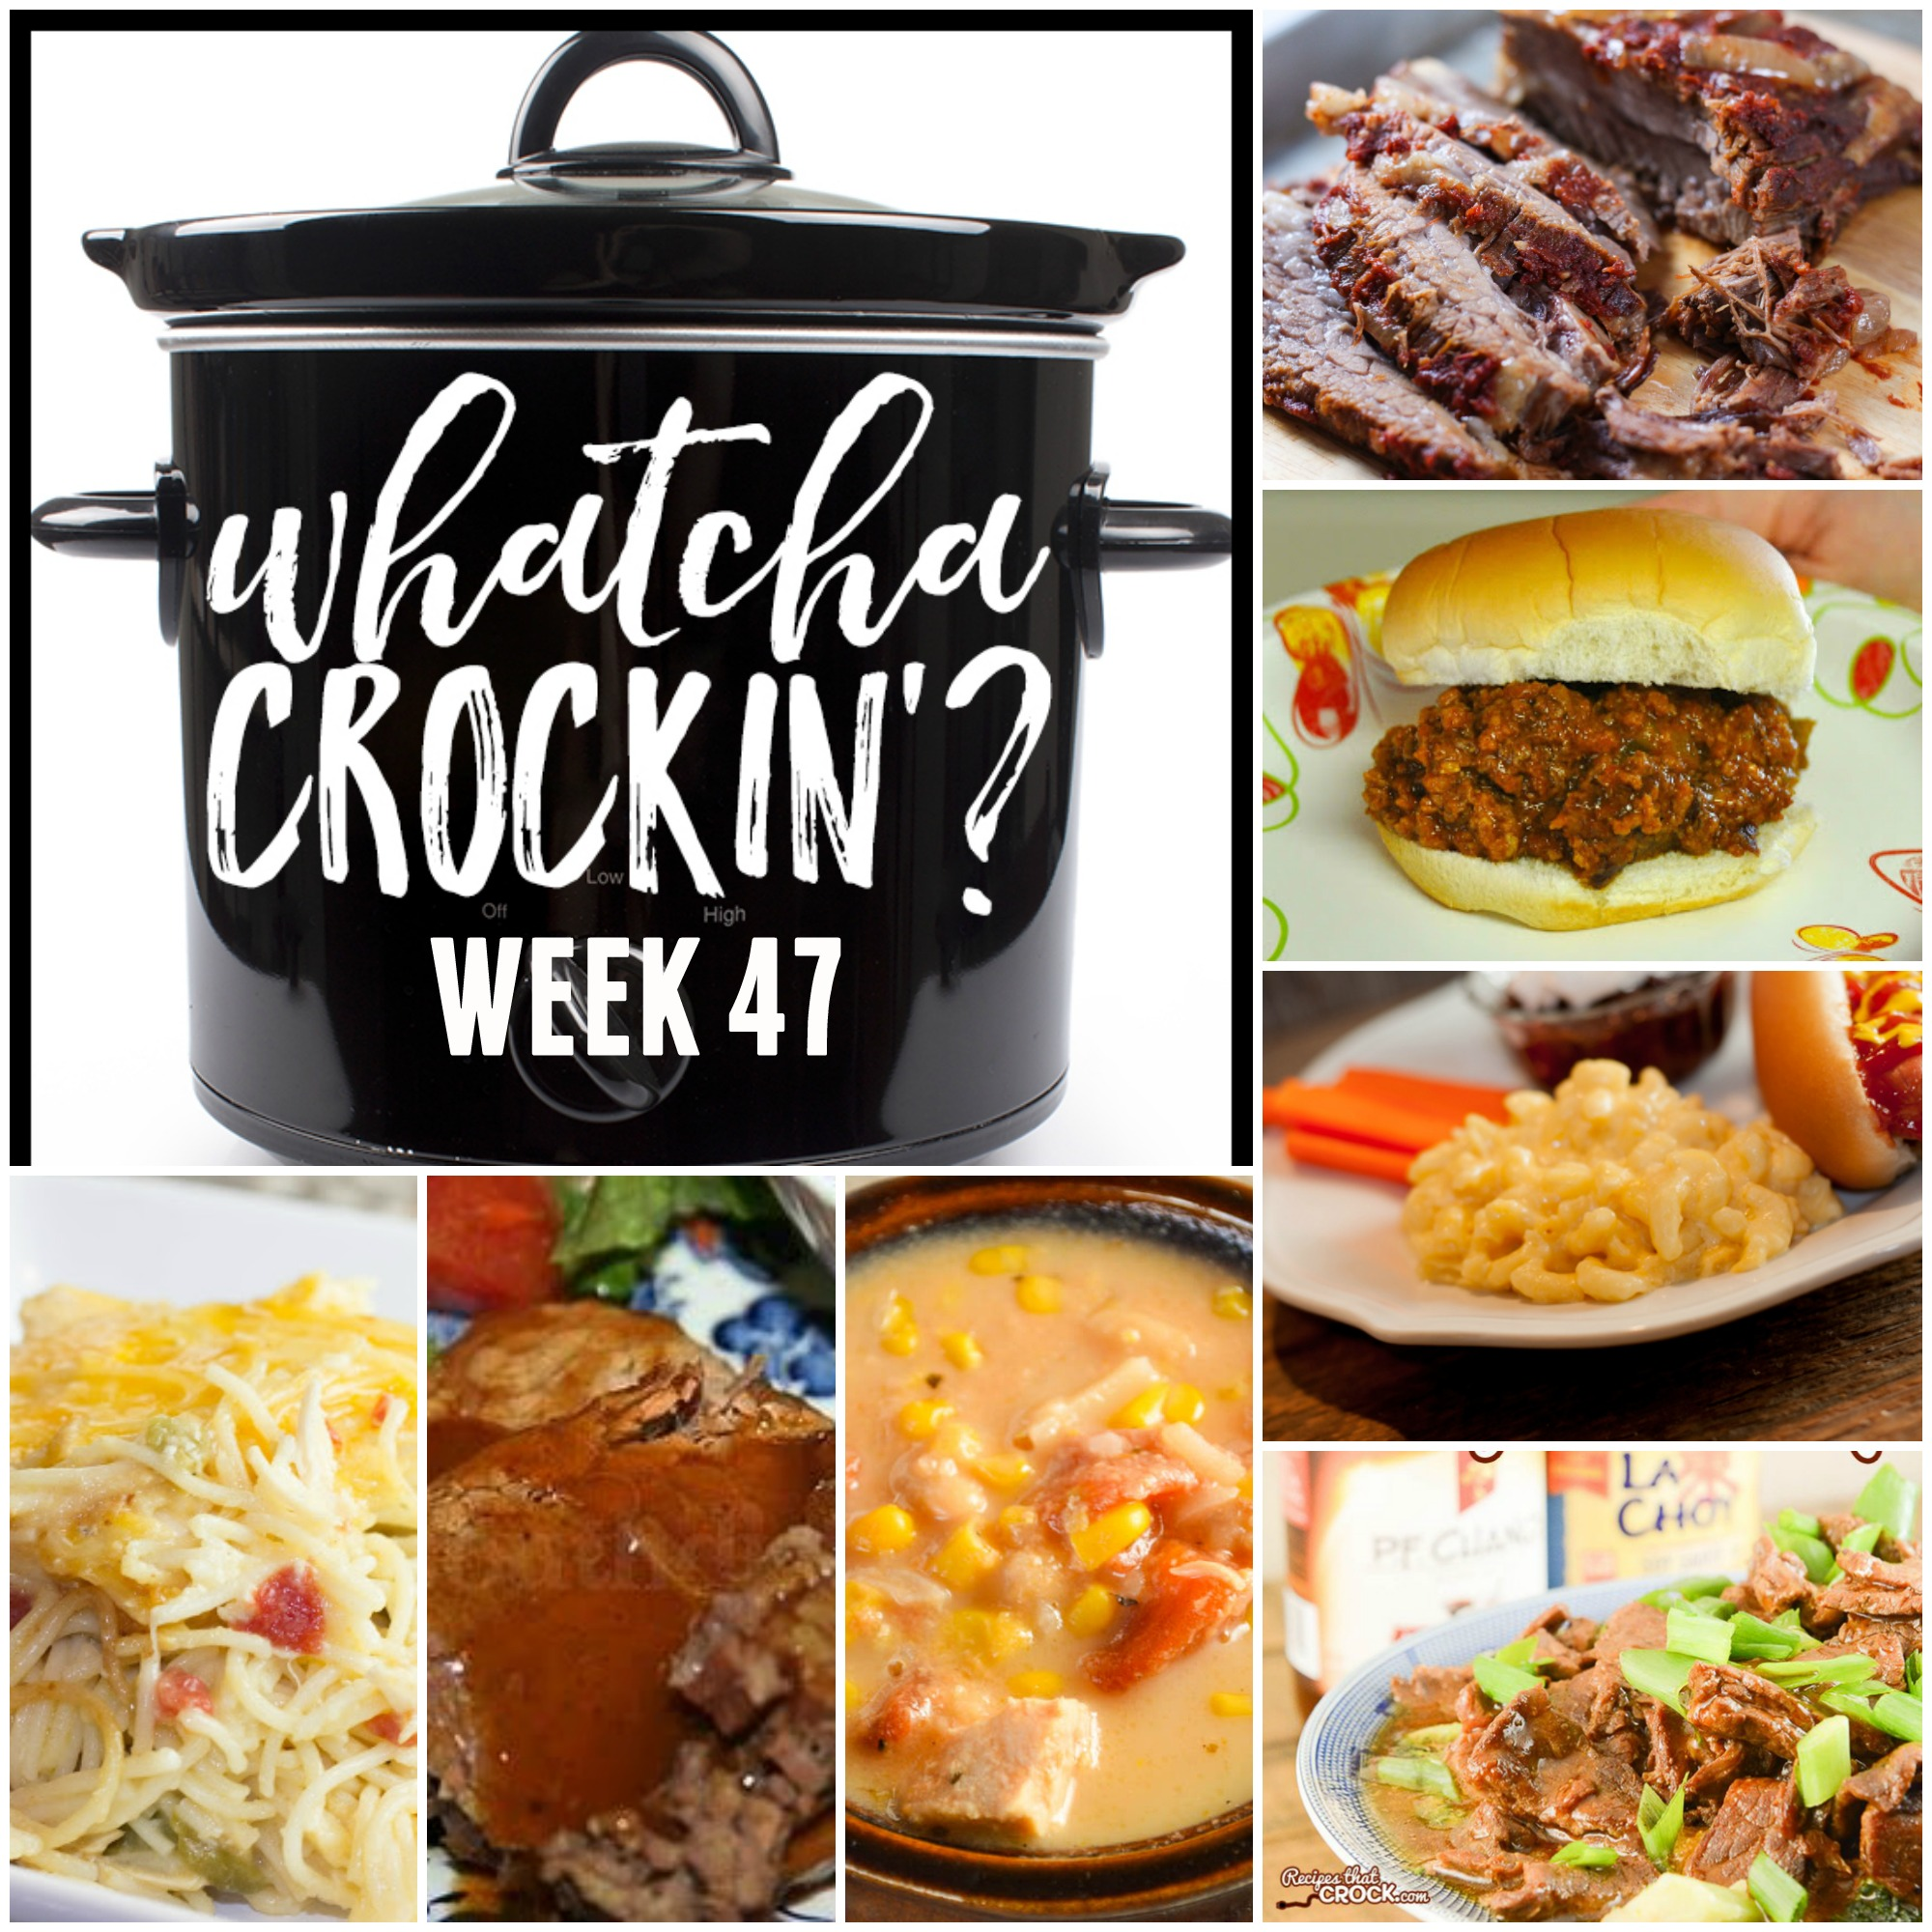 Crock Pot Spicy Cheesy Chicken Spaghetti - WCW Week 47 - Recipes That Crock!